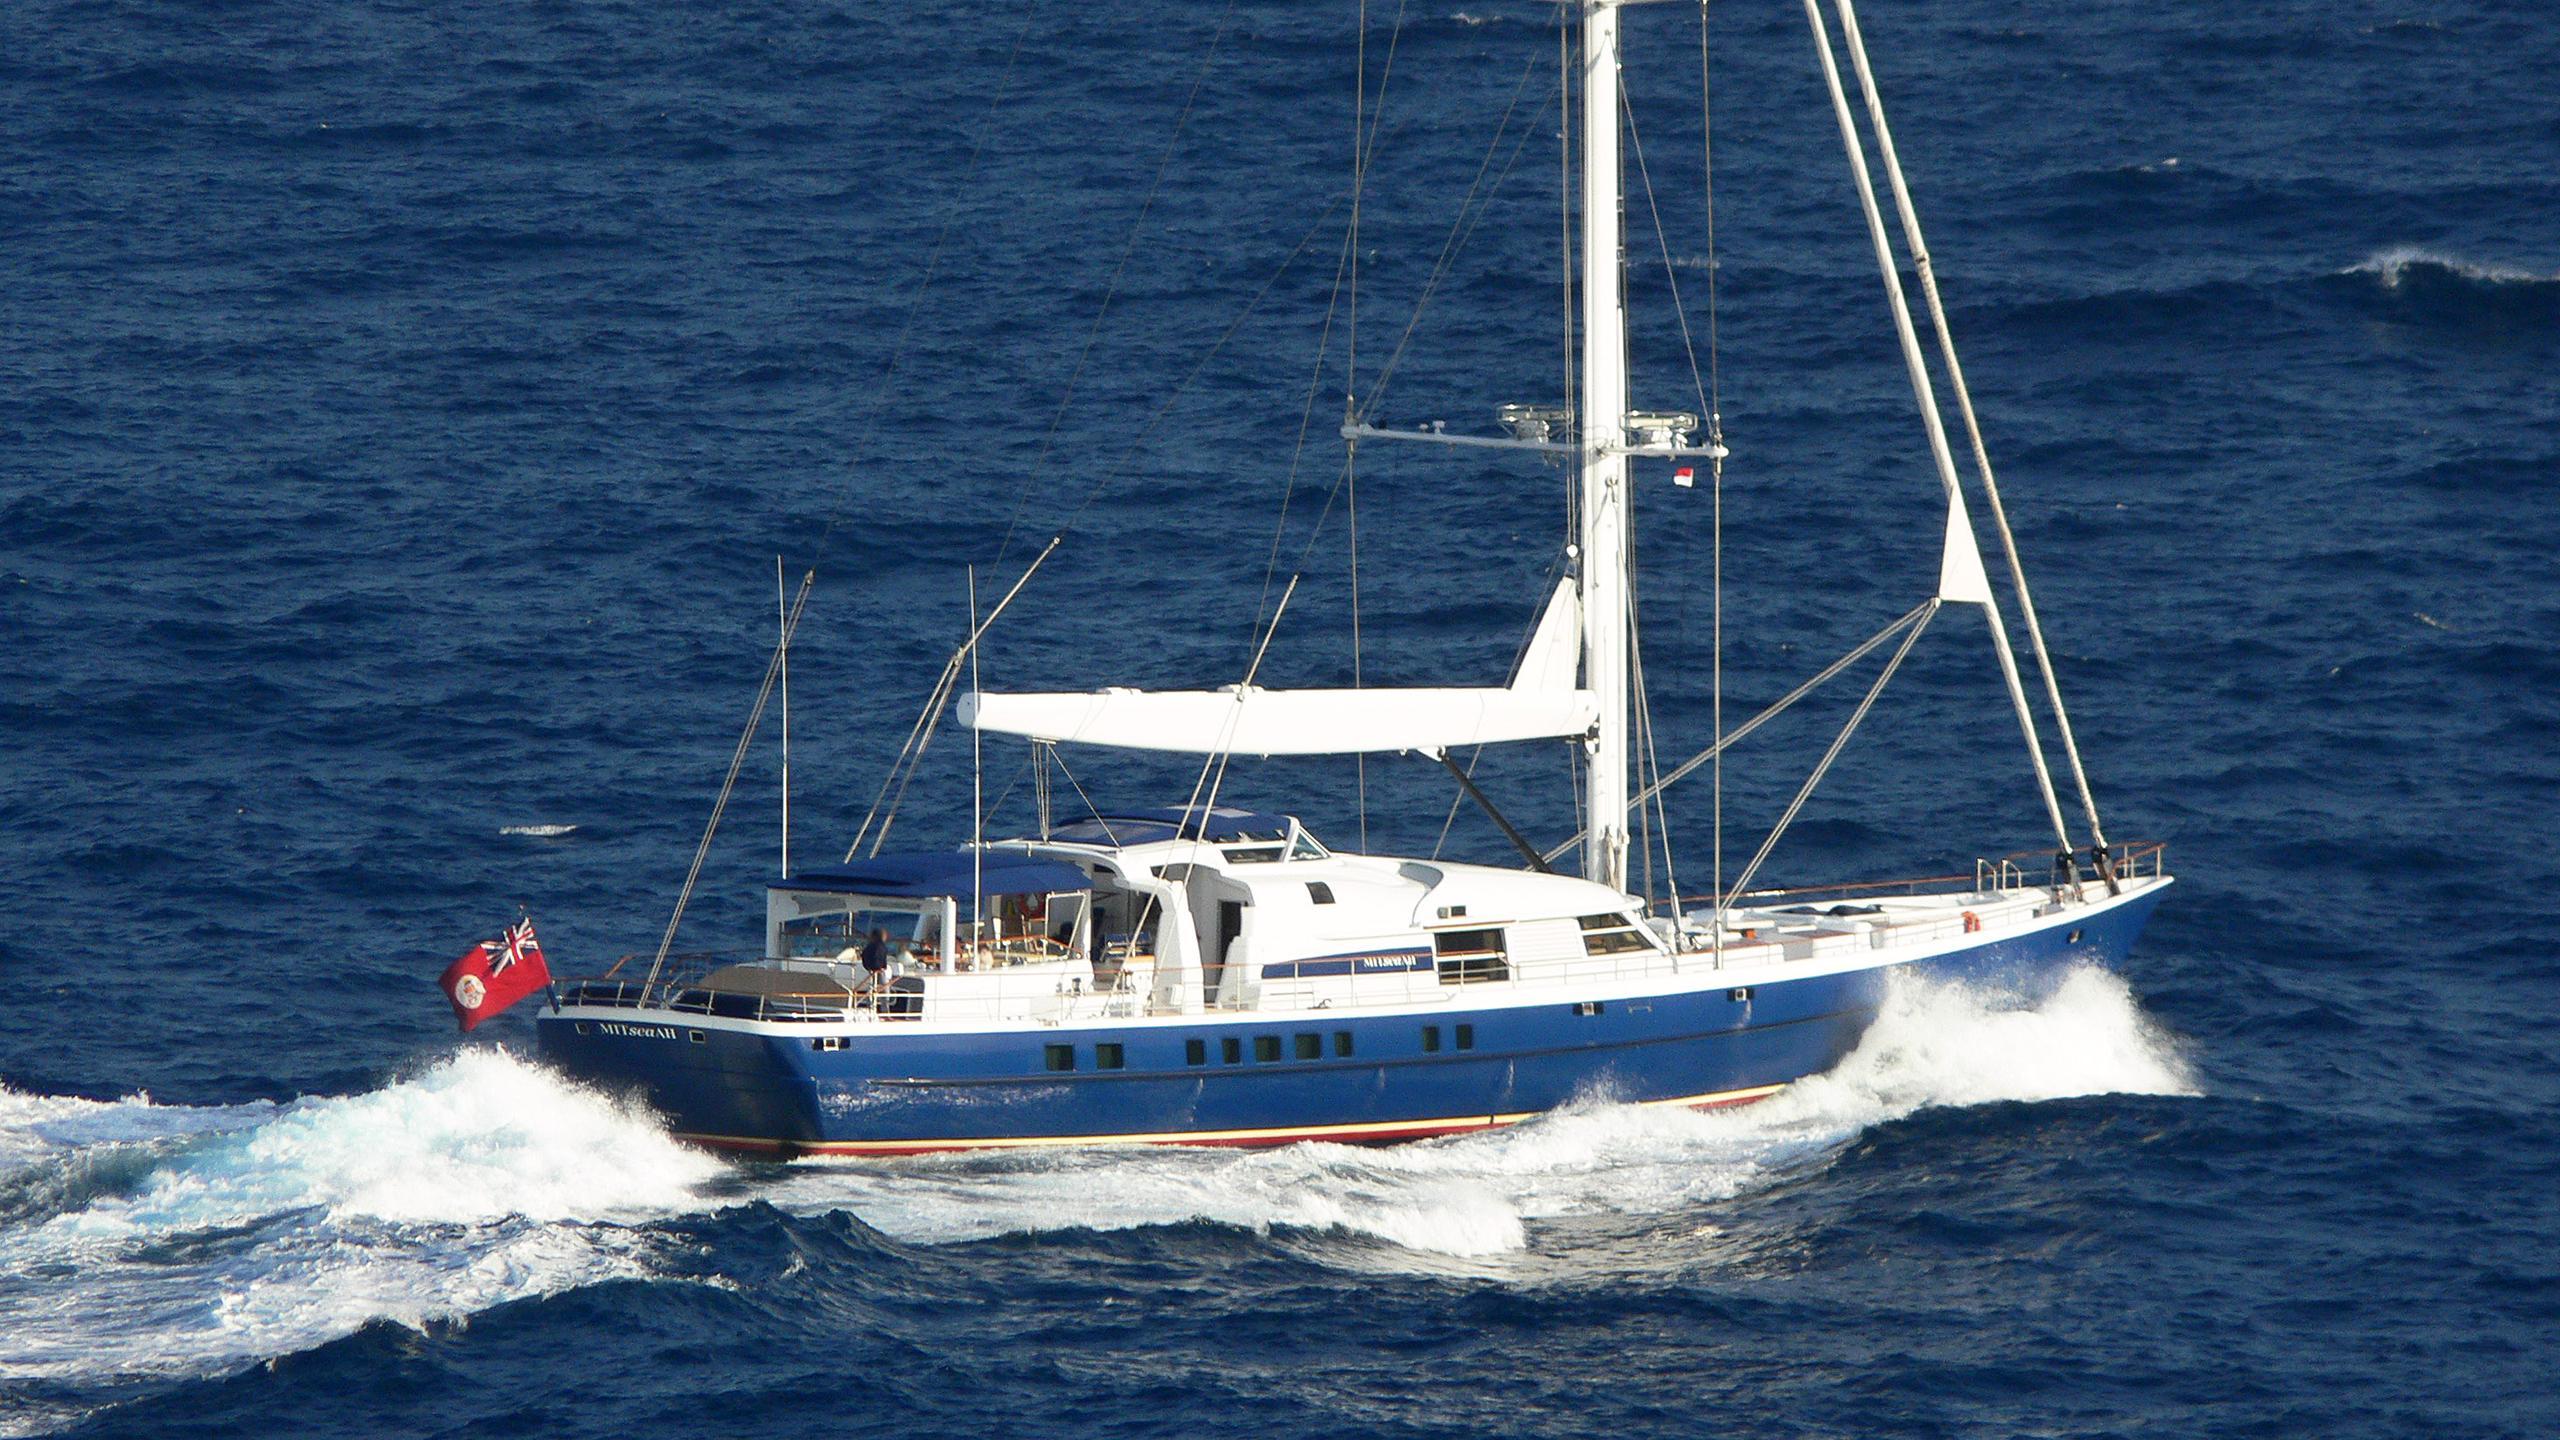 mitseaah-sailing-yacht-pendennis-2004-47m-cruising-stern